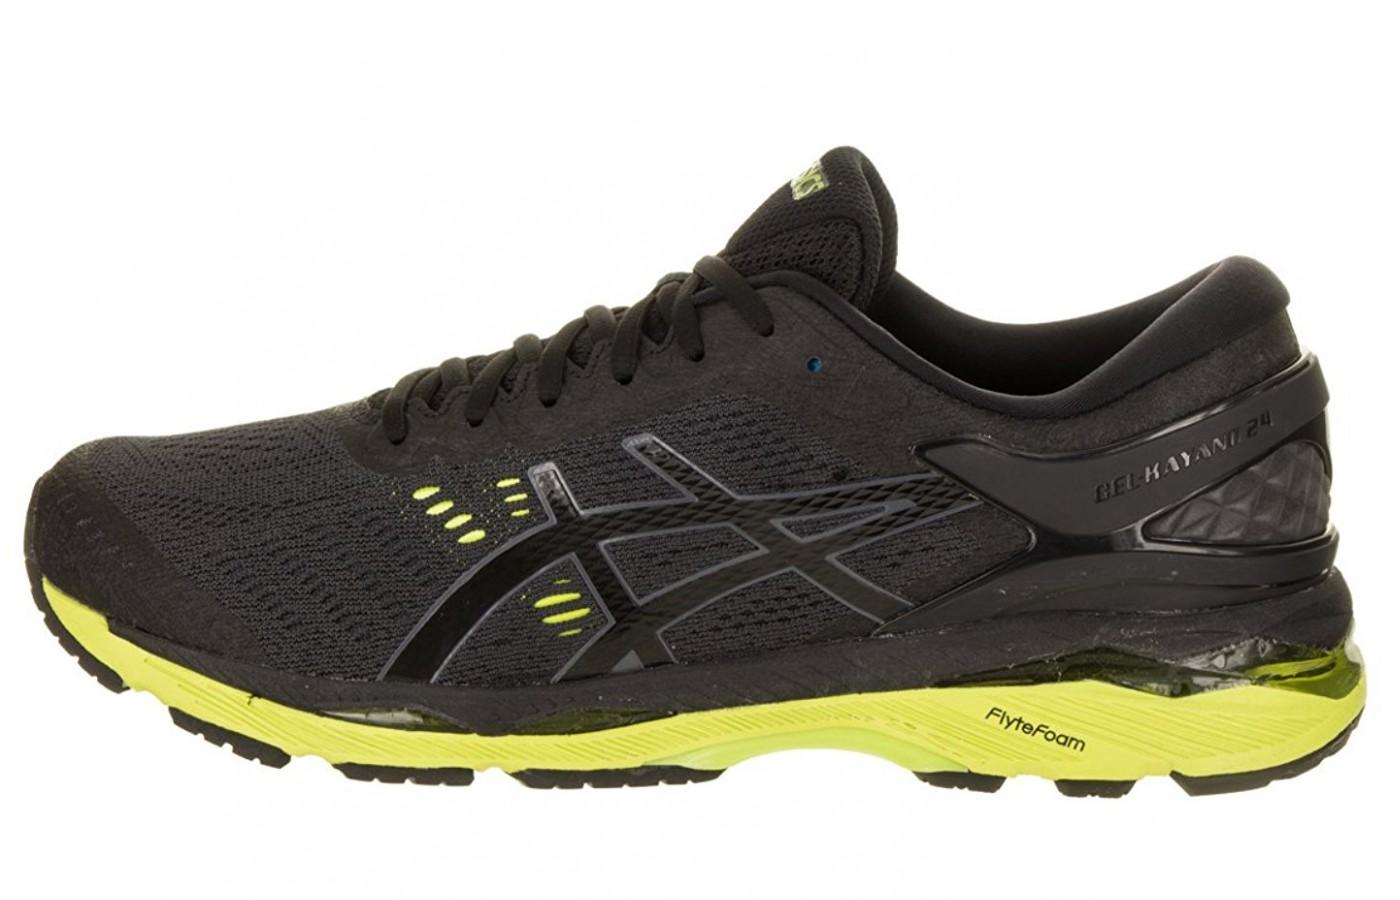 Best Running Shoes Asics Kayano